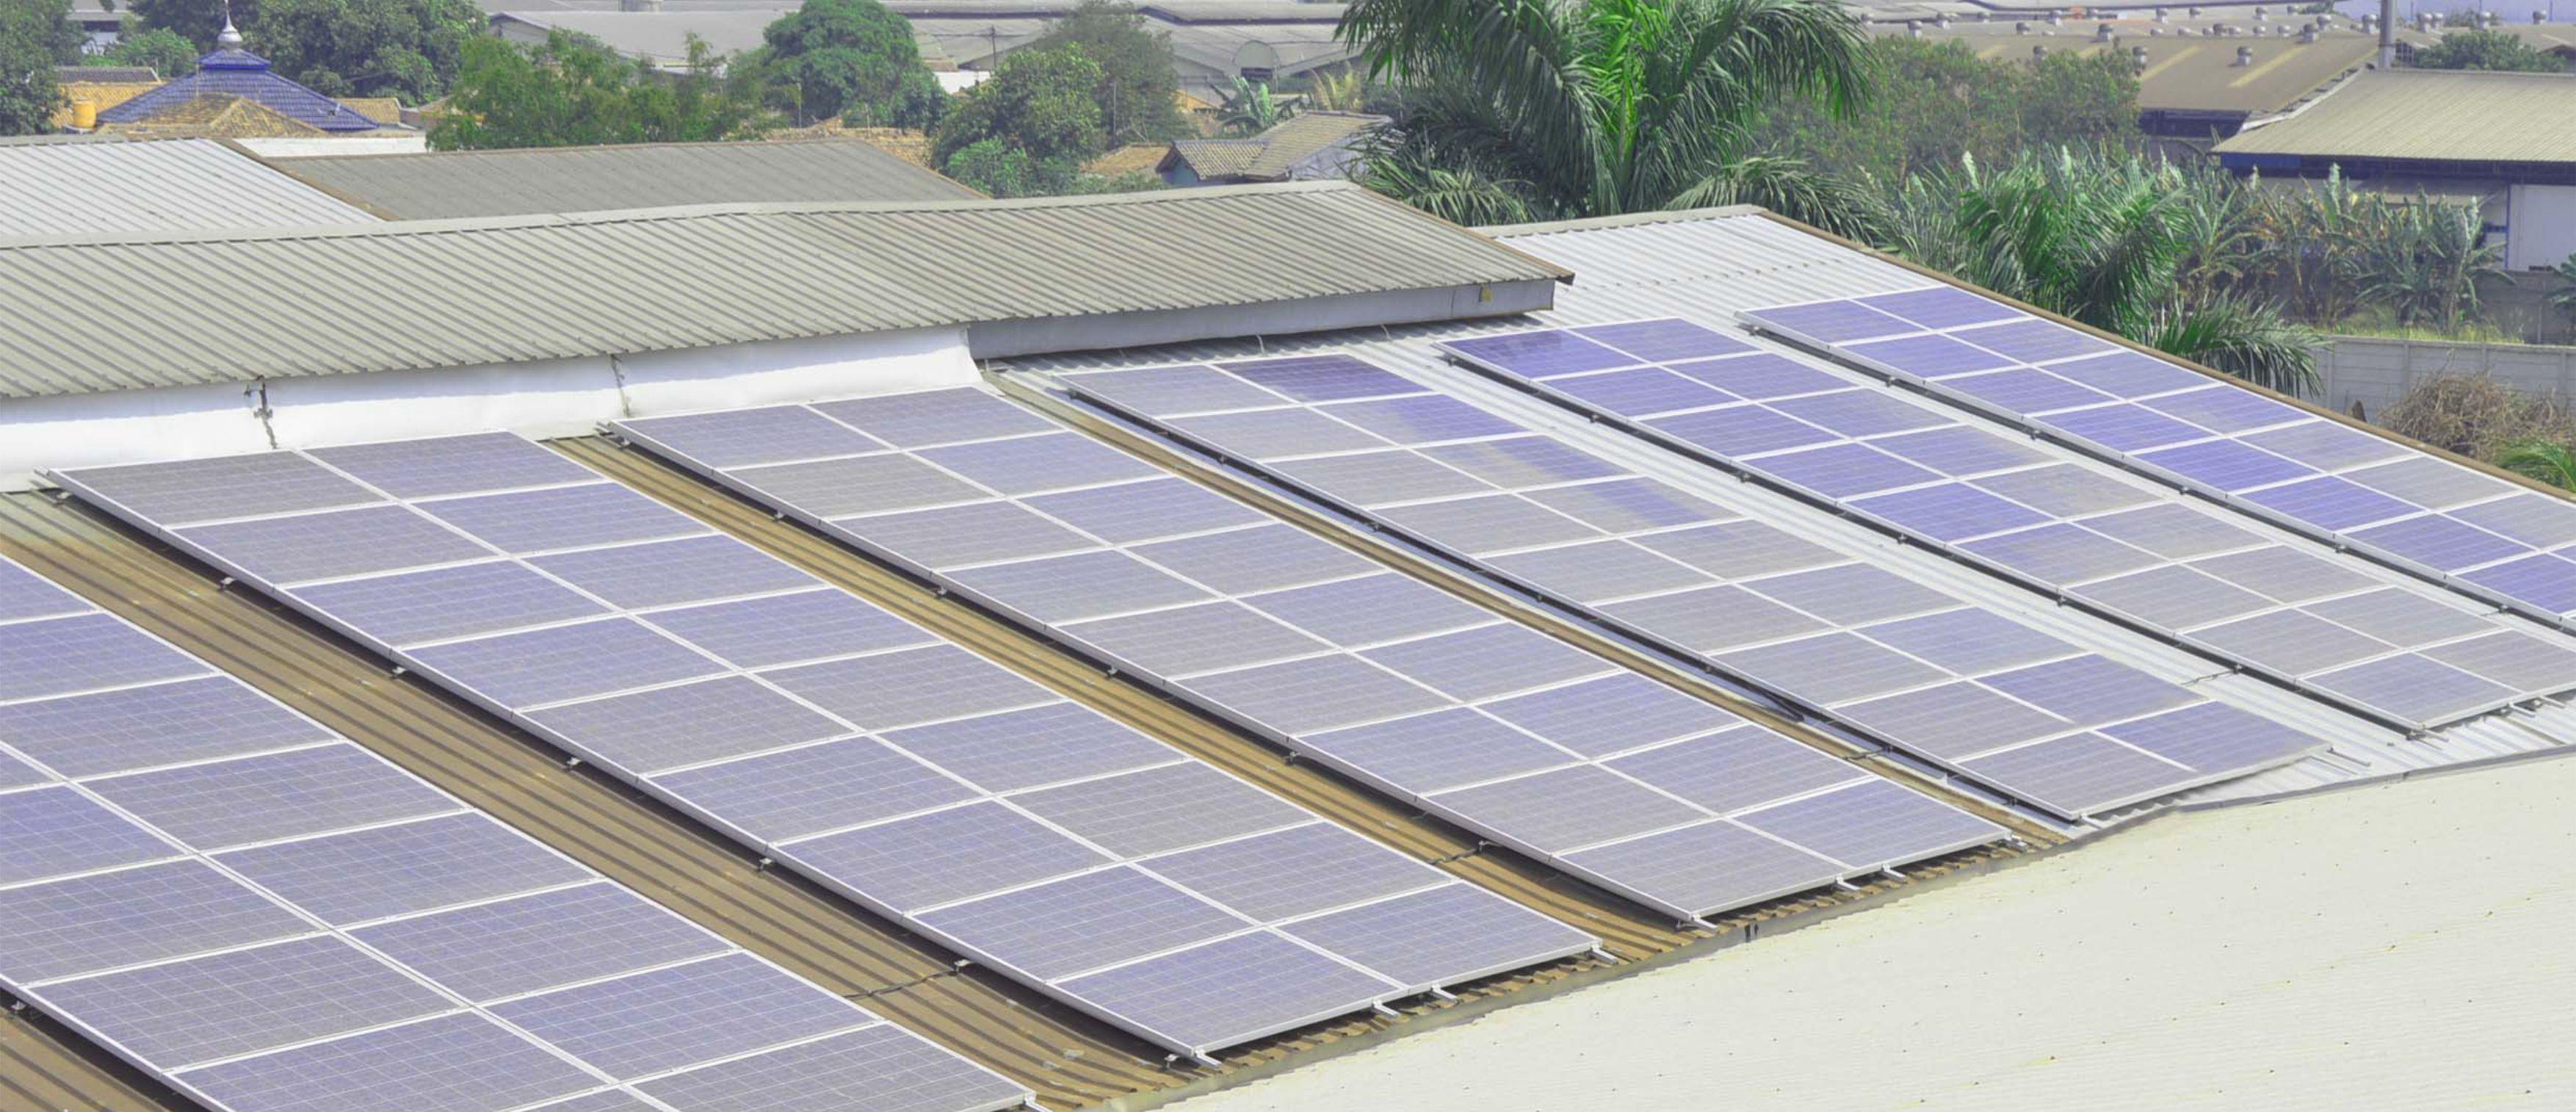 Sekilas tentang Photovoltaic